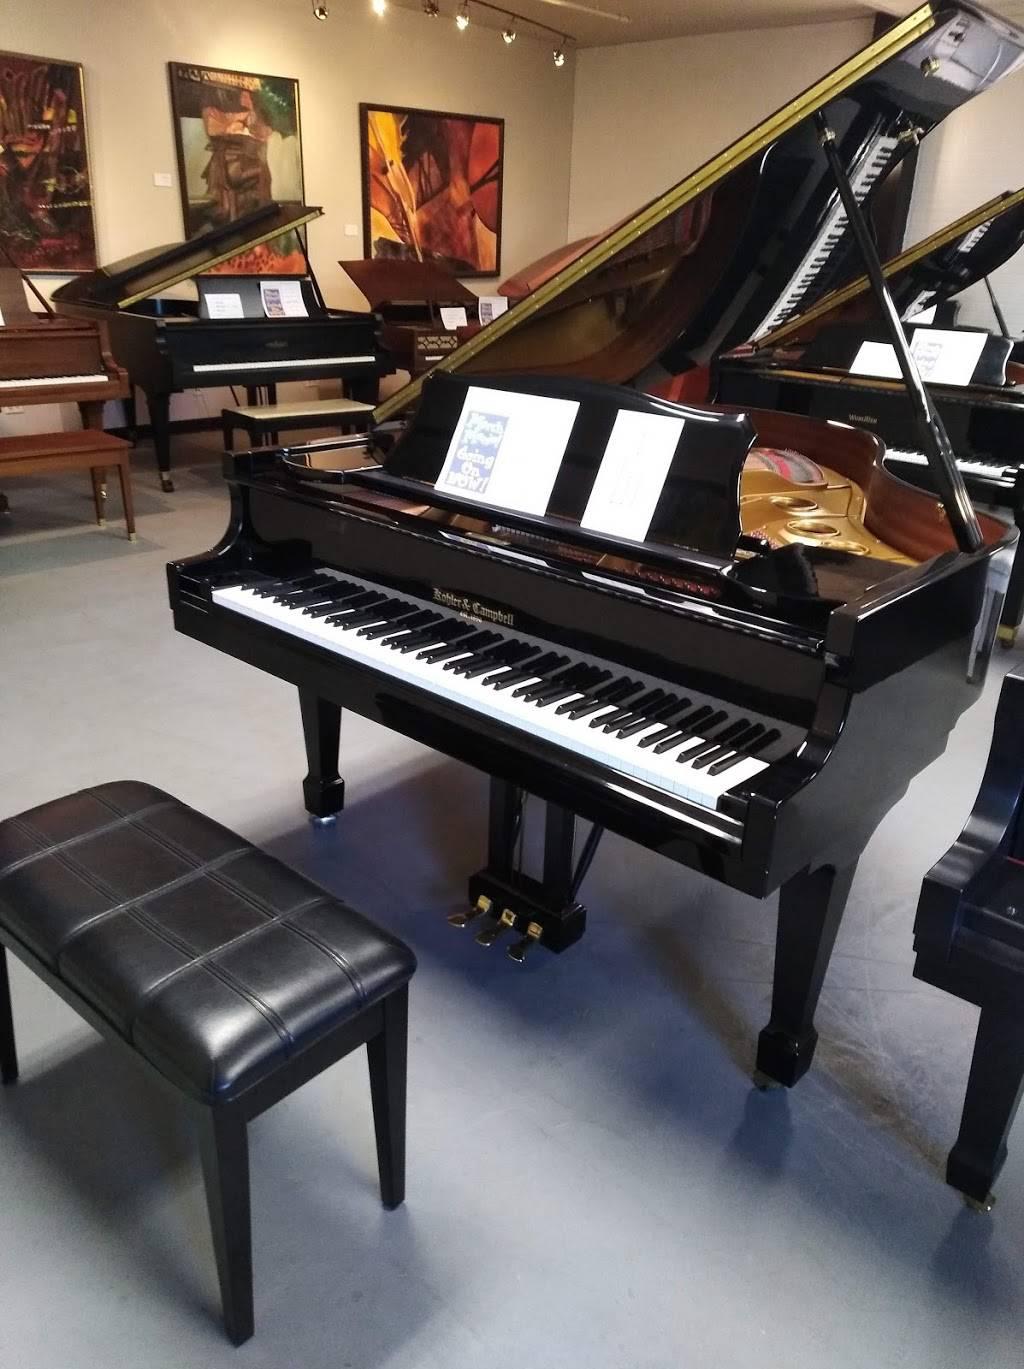 Portland Piano Company - electronics store  | Photo 9 of 9 | Address: 8700 NE Columbia Blvd, Portland, OR 97220, USA | Phone: (503) 775-2480